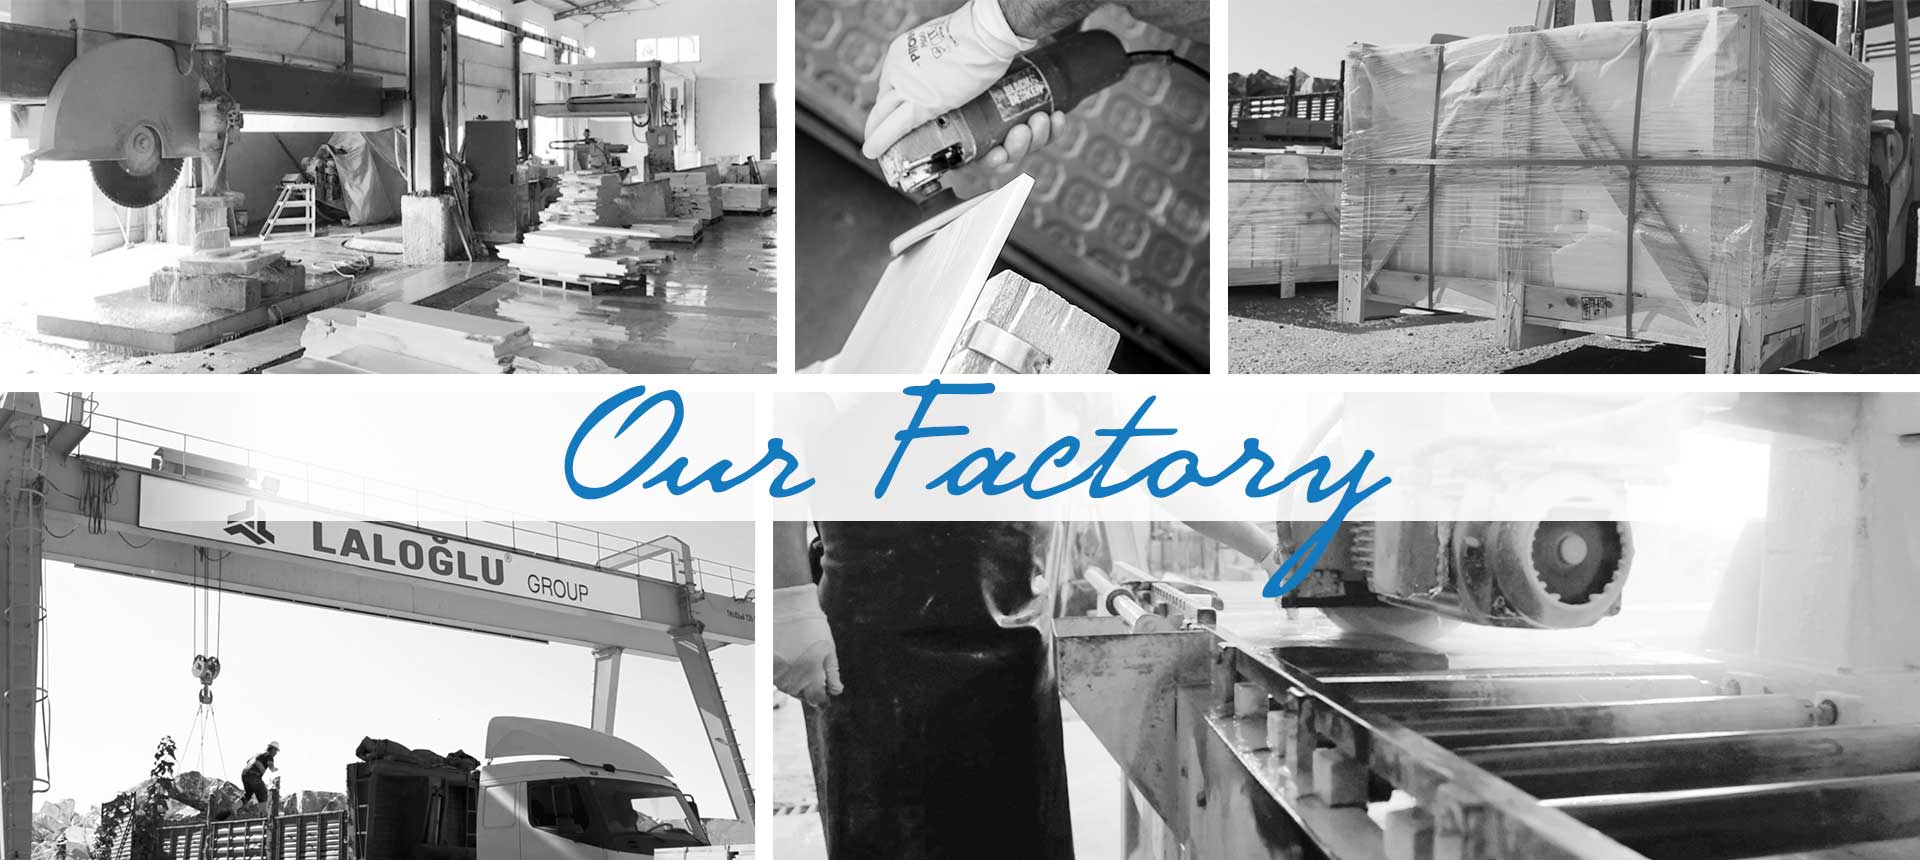 laloglu factory slayt